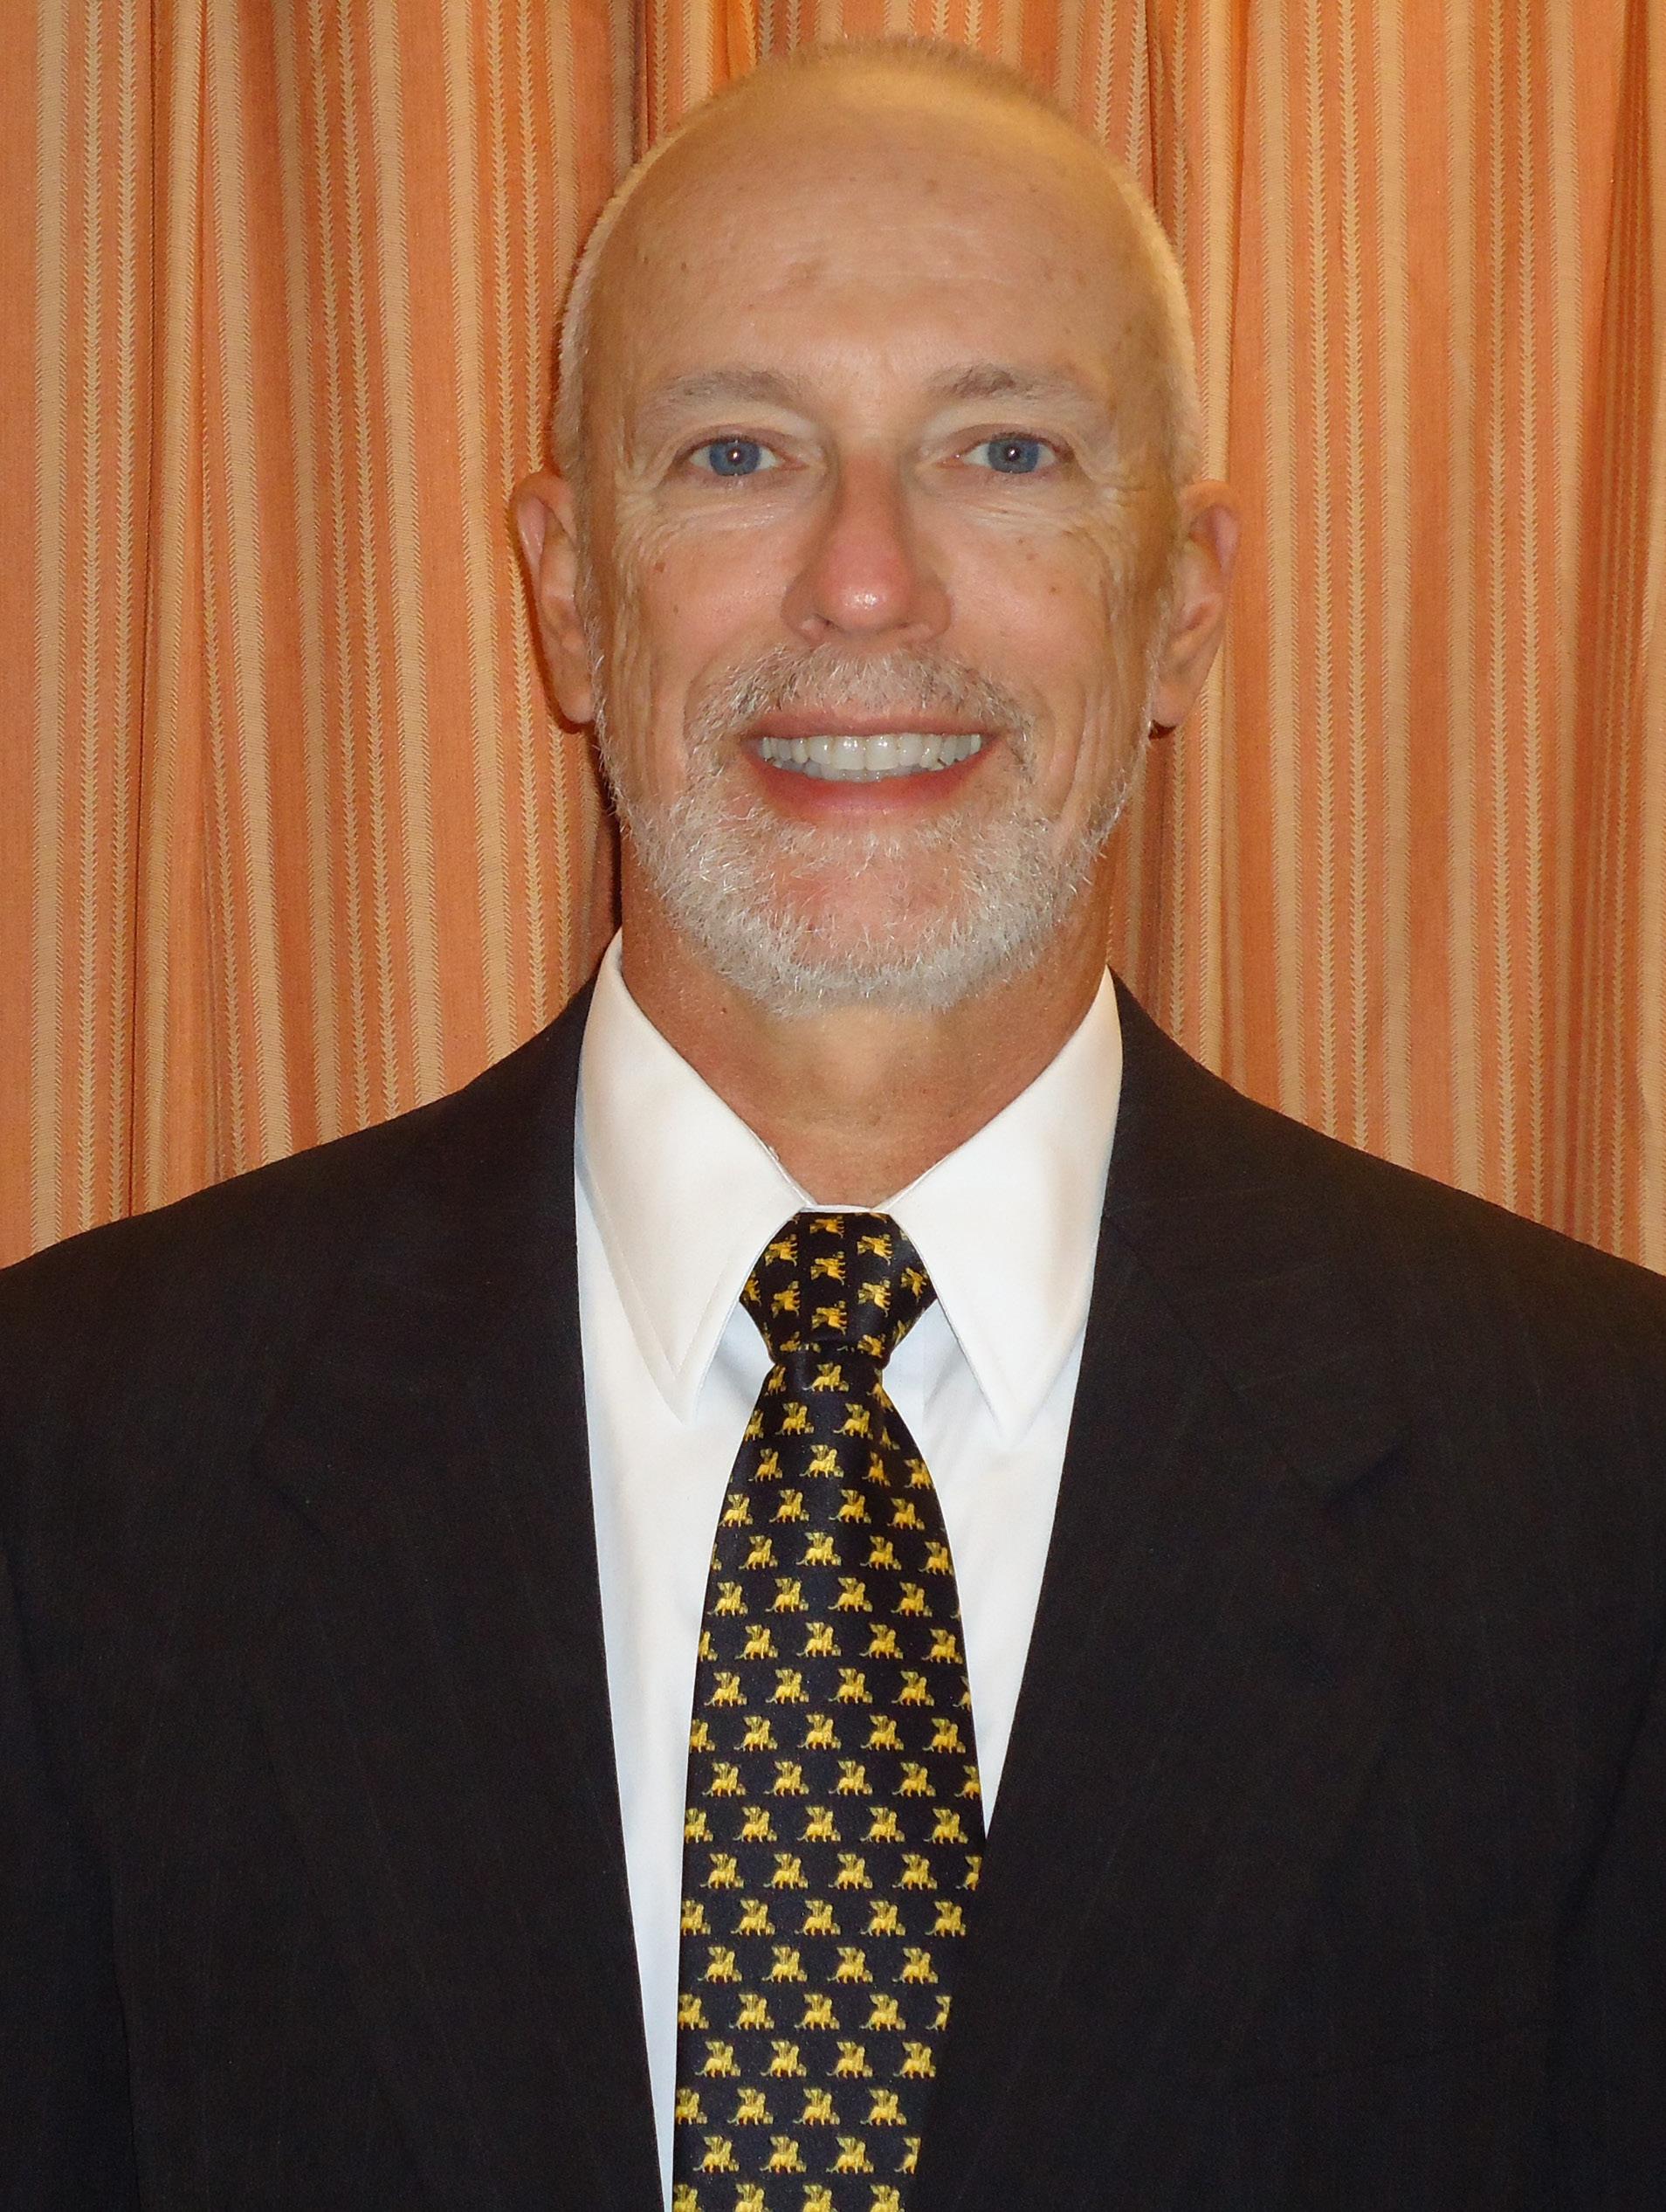 Scott Brower